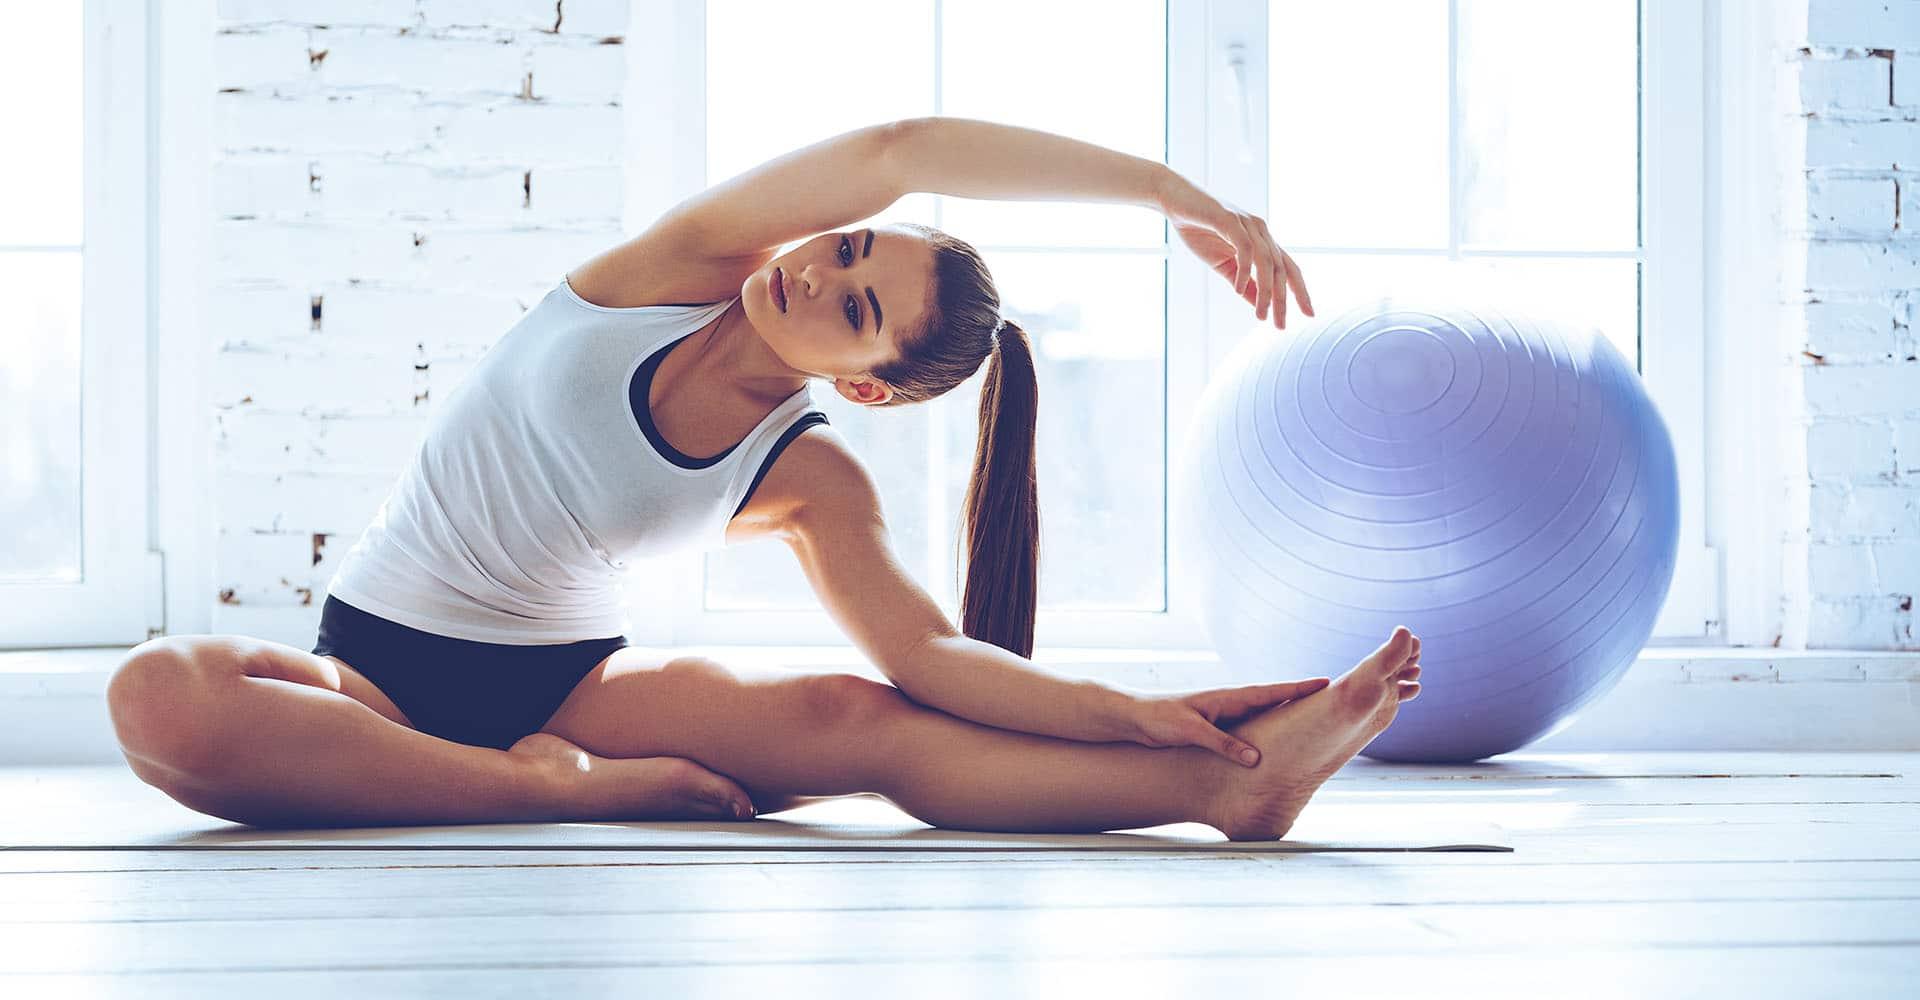 Frau trainiert zuhause mit Gymnastikball